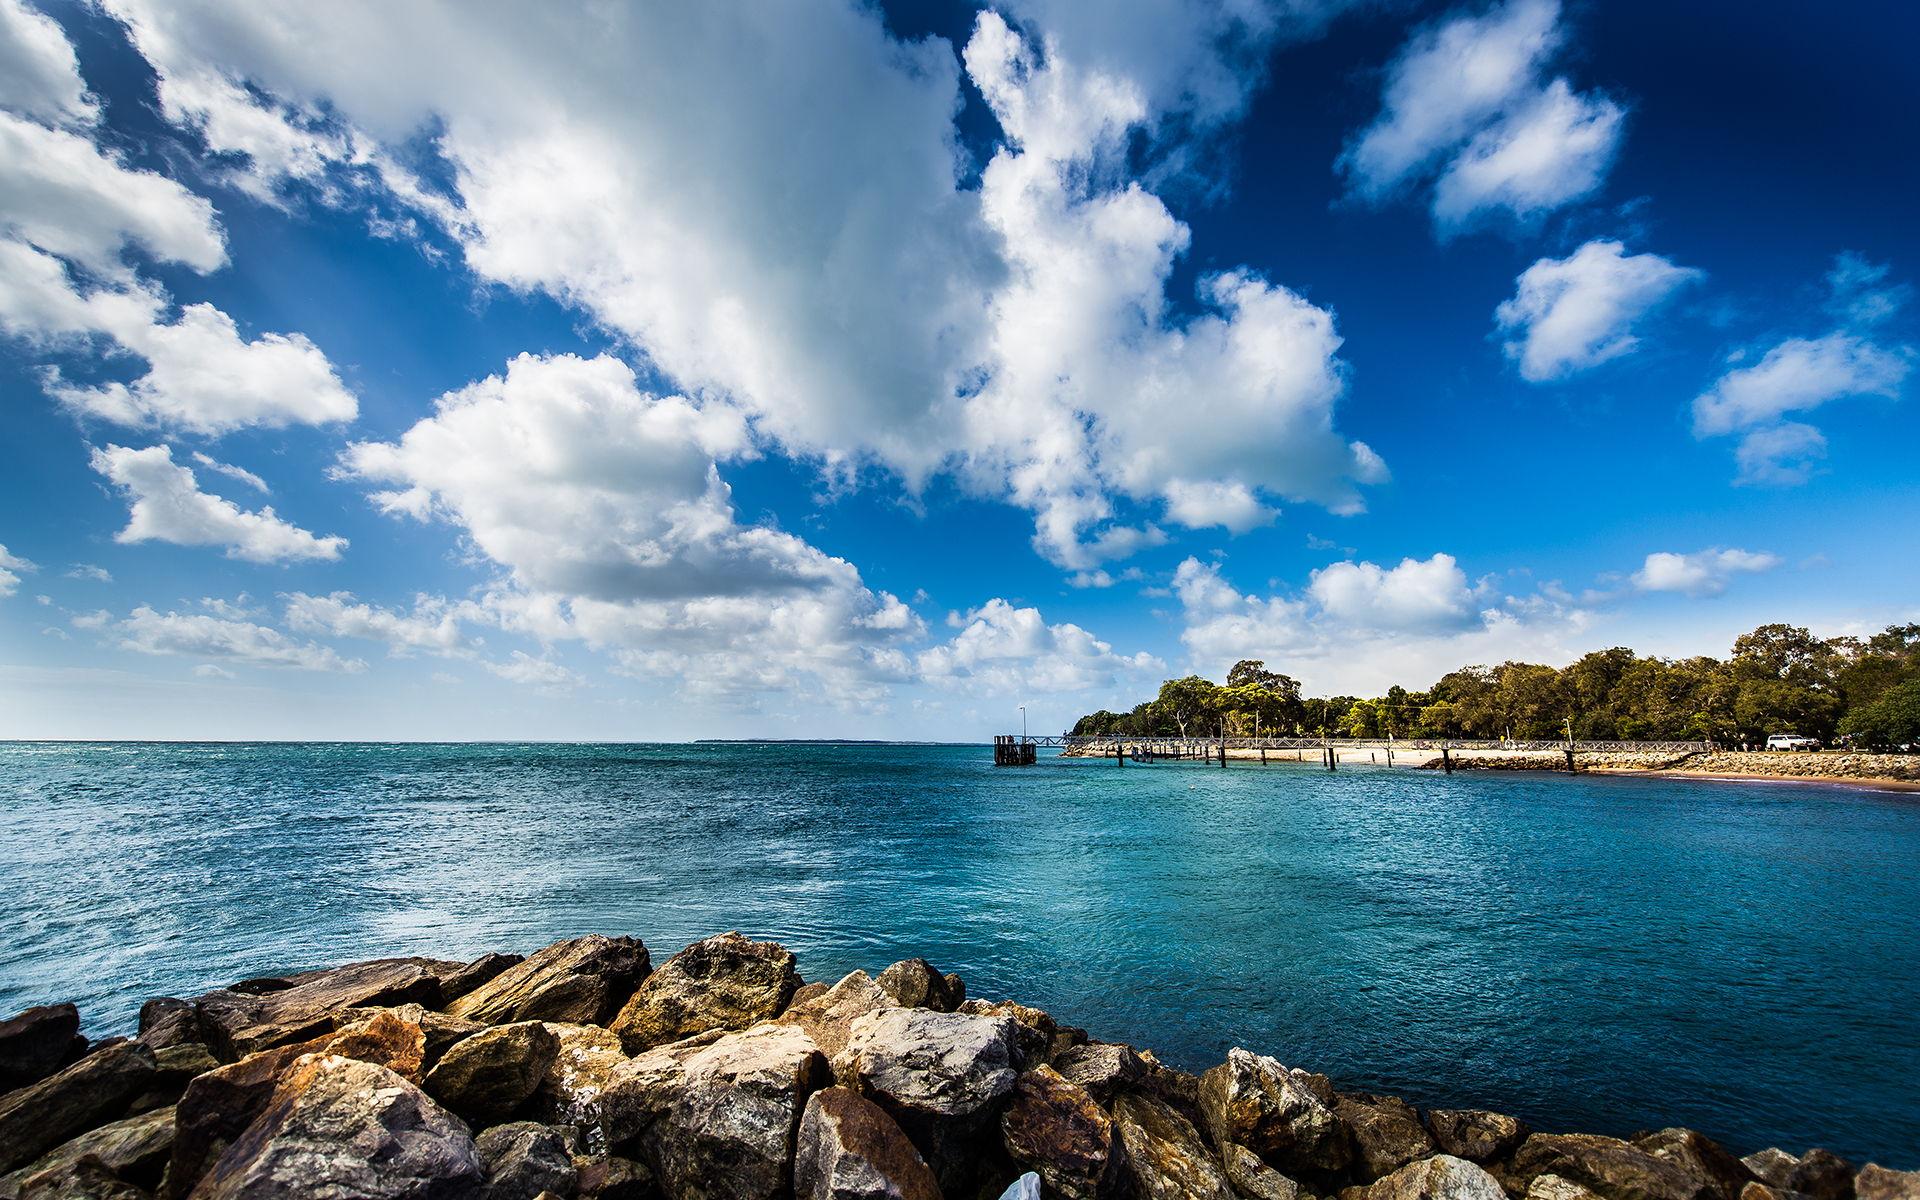 Ocean Landscape Wallpapers HD Pictures Live HD Wallpaper 1920x1200